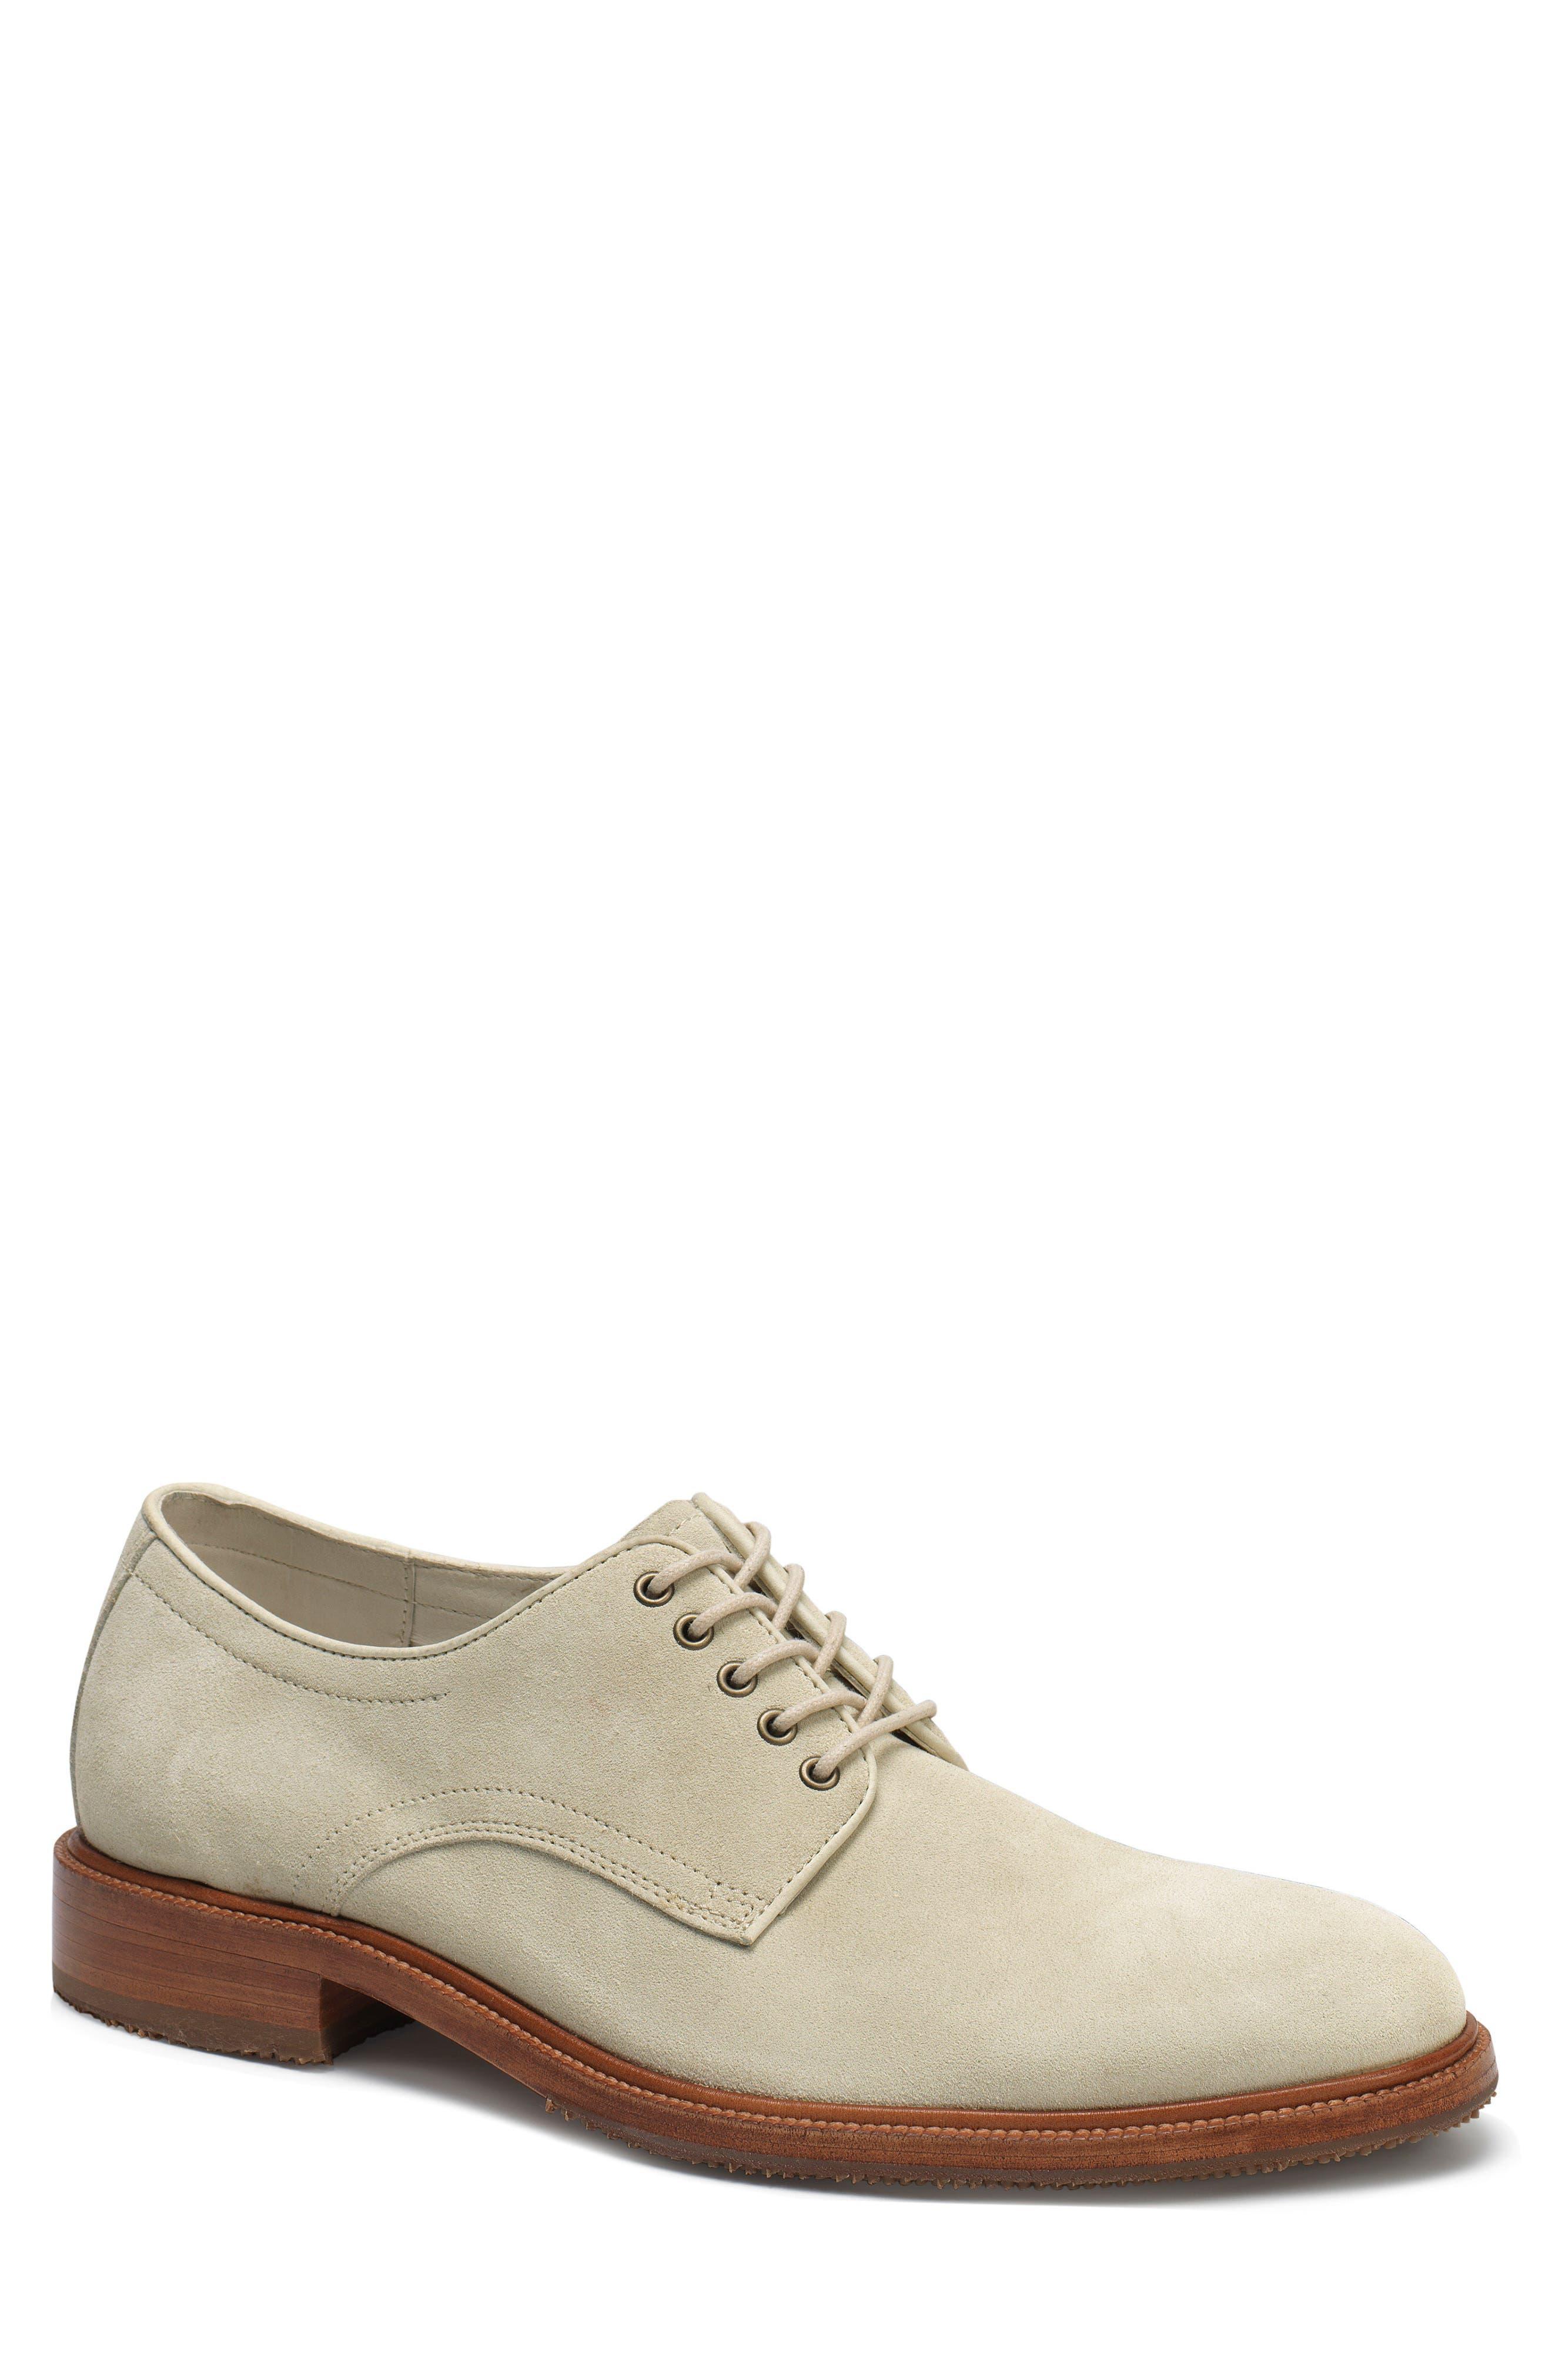 Landry Plain Toe Derby,                         Main,                         color, Stone White Suede